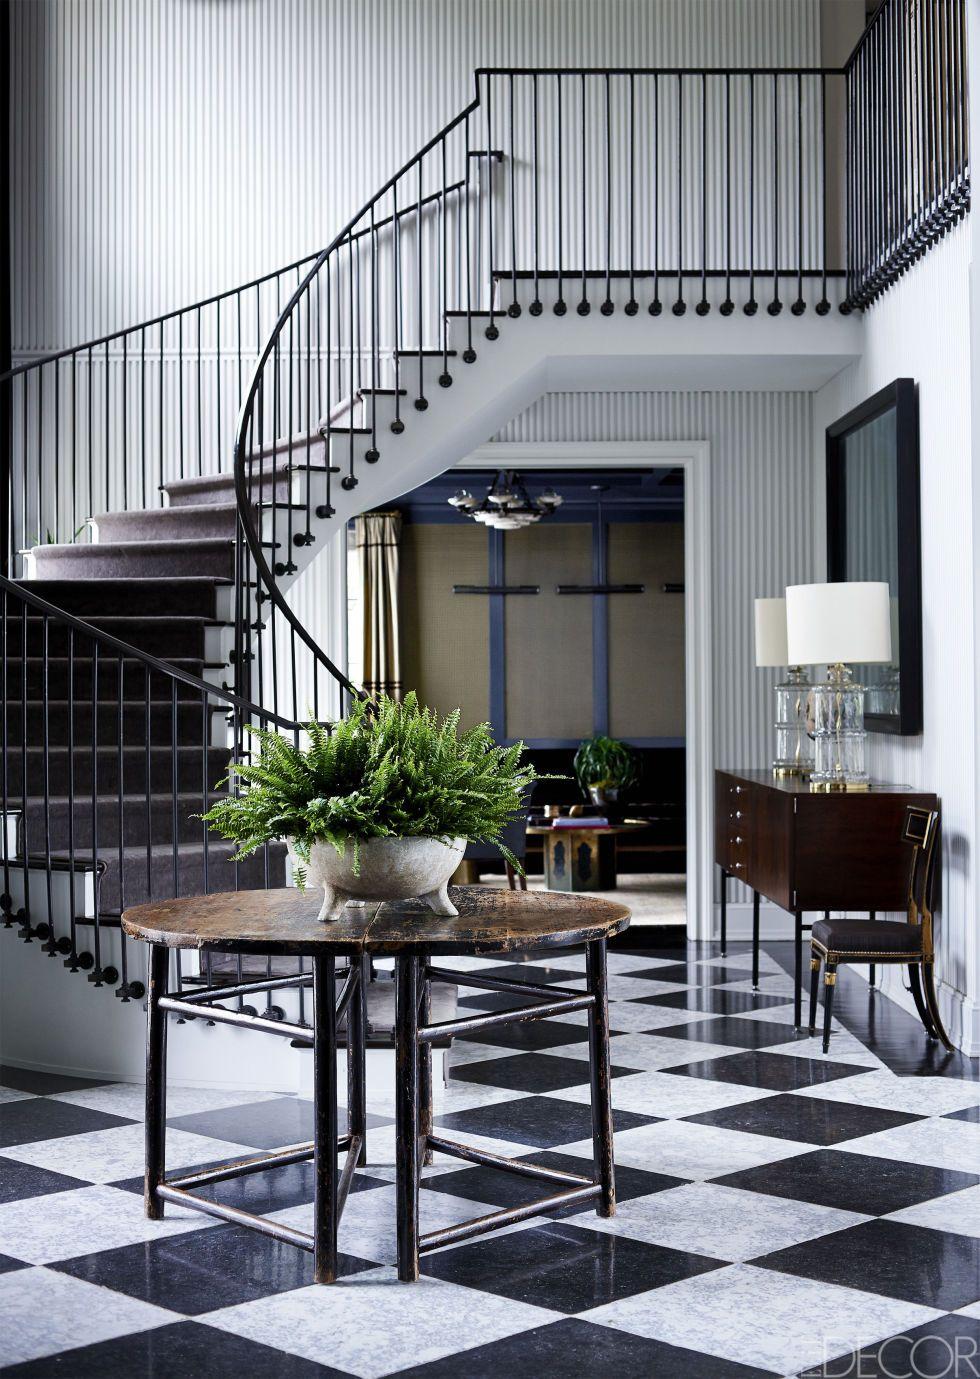 House HOUSE TOUR A Minimalist Mansion Designed